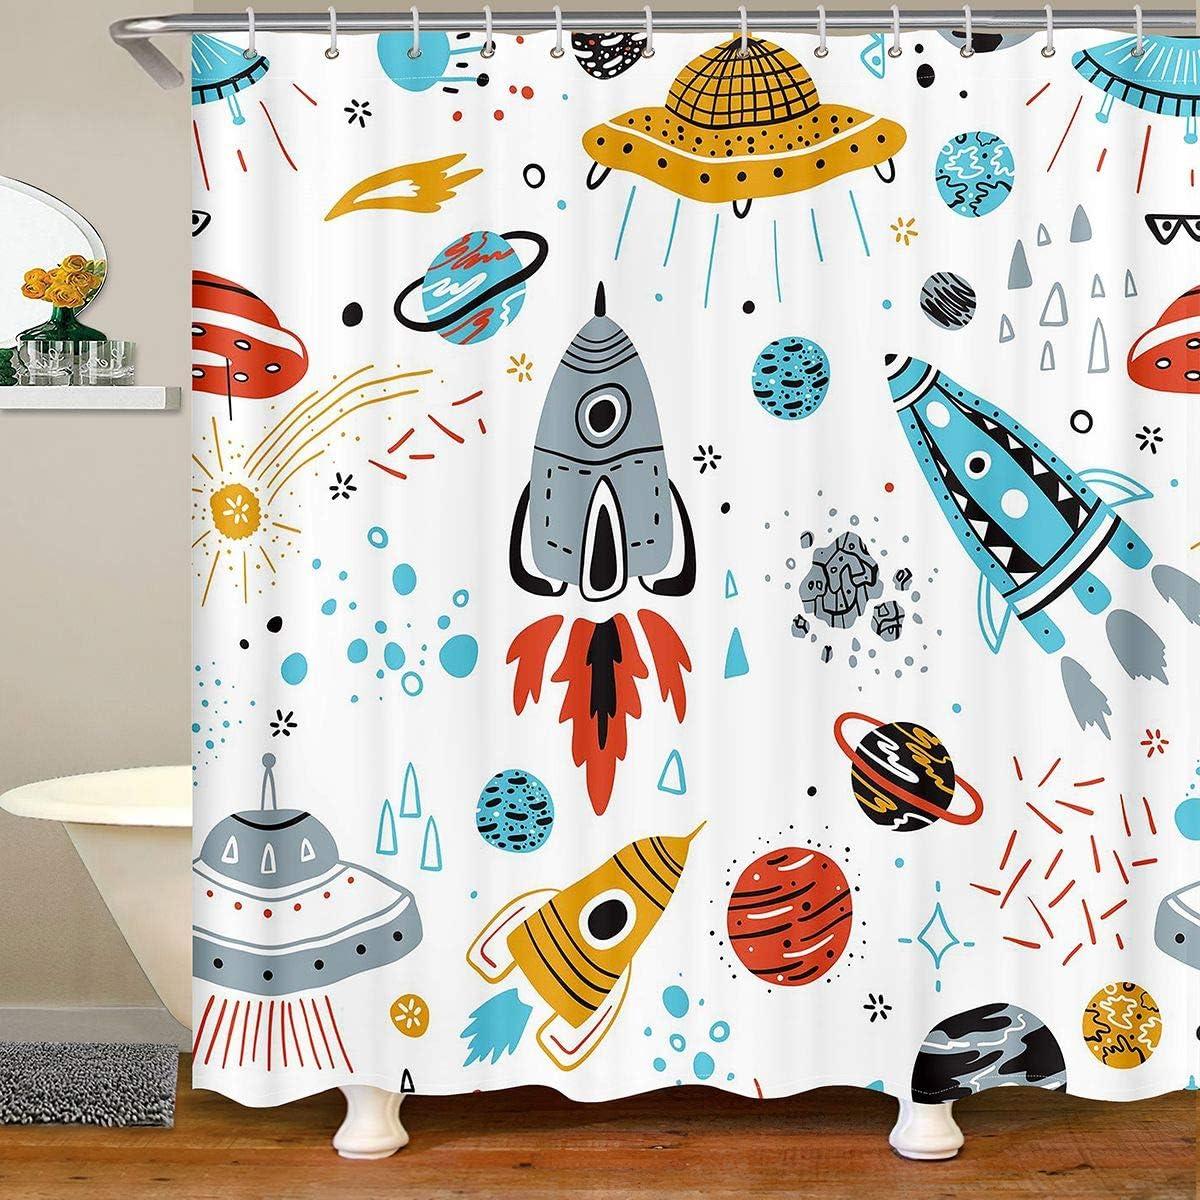 Feelyou Kids Space Rocket Shower Curtain Boys Universe Planet Bathroom Shower Curtain Set for Children Outer Space Adventure Bath Curtain Space Ship Design Waterproof Room Decor 72